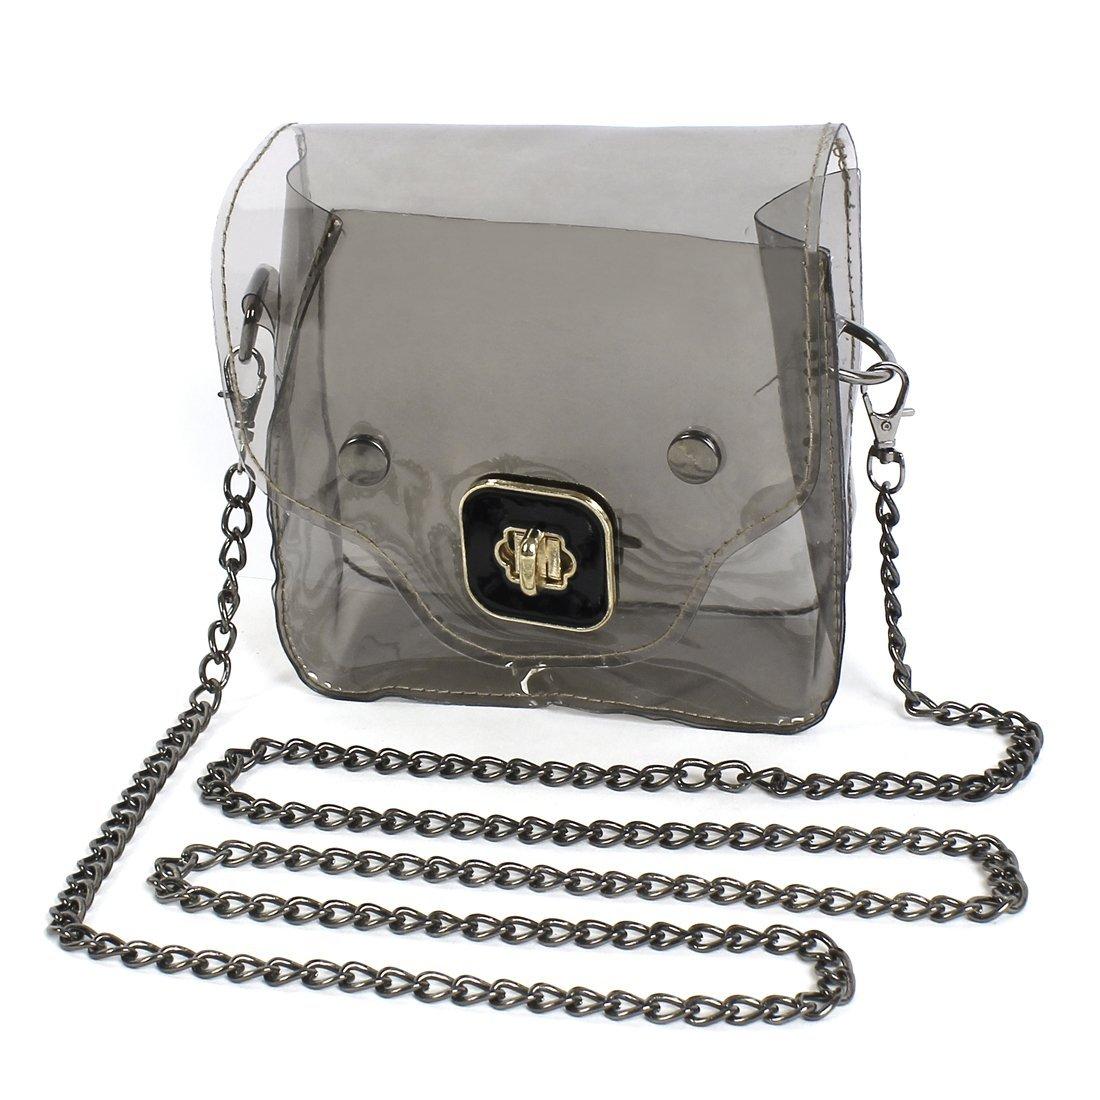 5x New jelly Transparent Shoulder Bag women small chian bag fashion shopping hangout bag ...